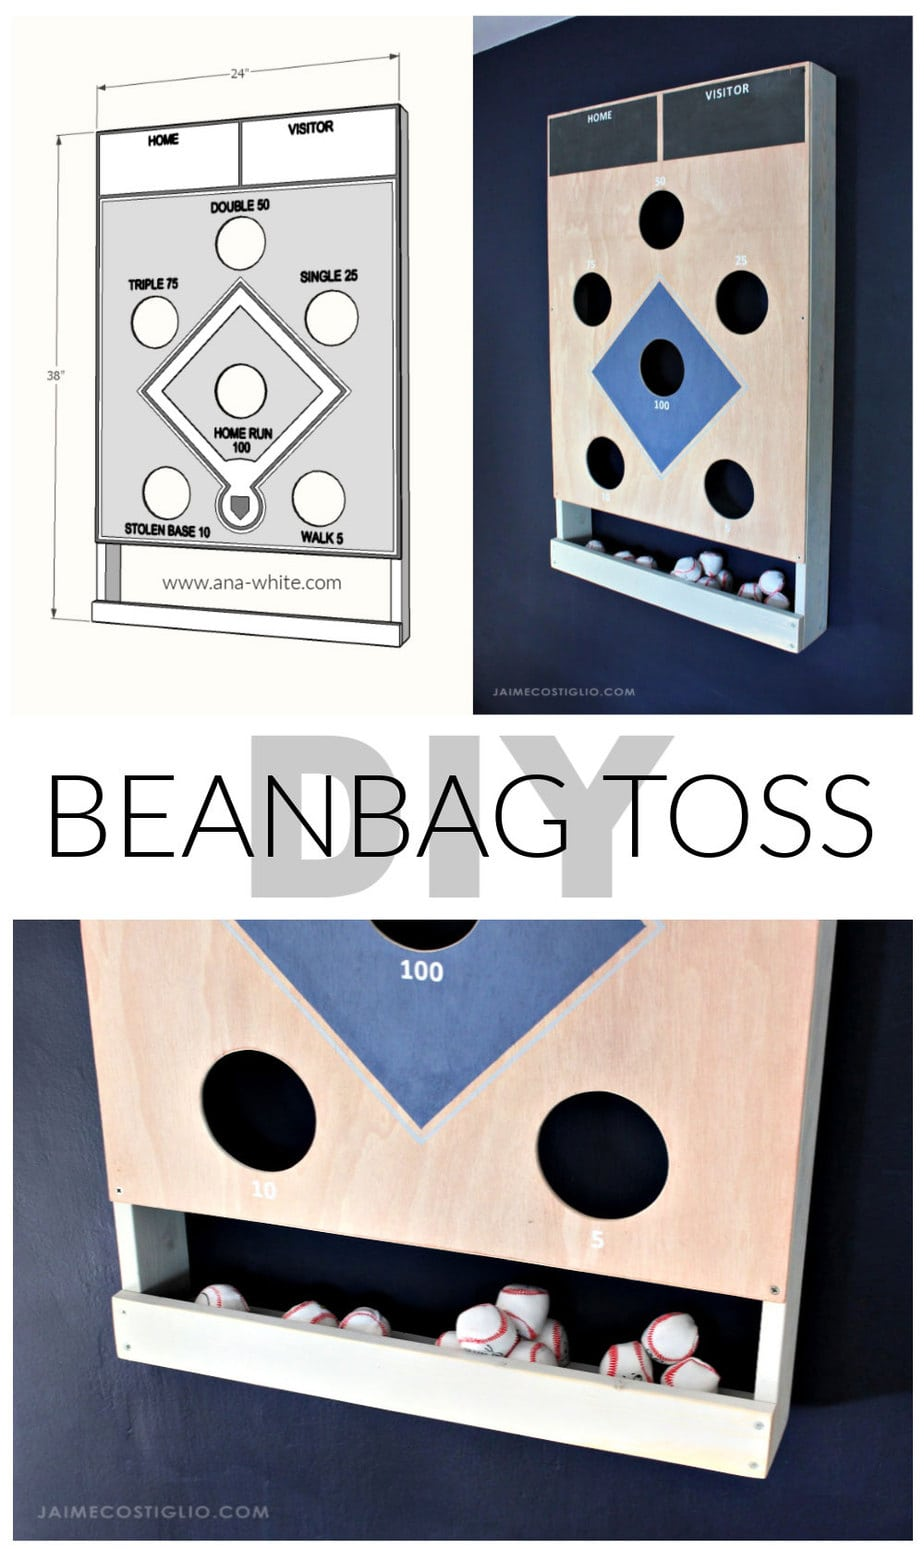 diy baseball beanbag toss game plans